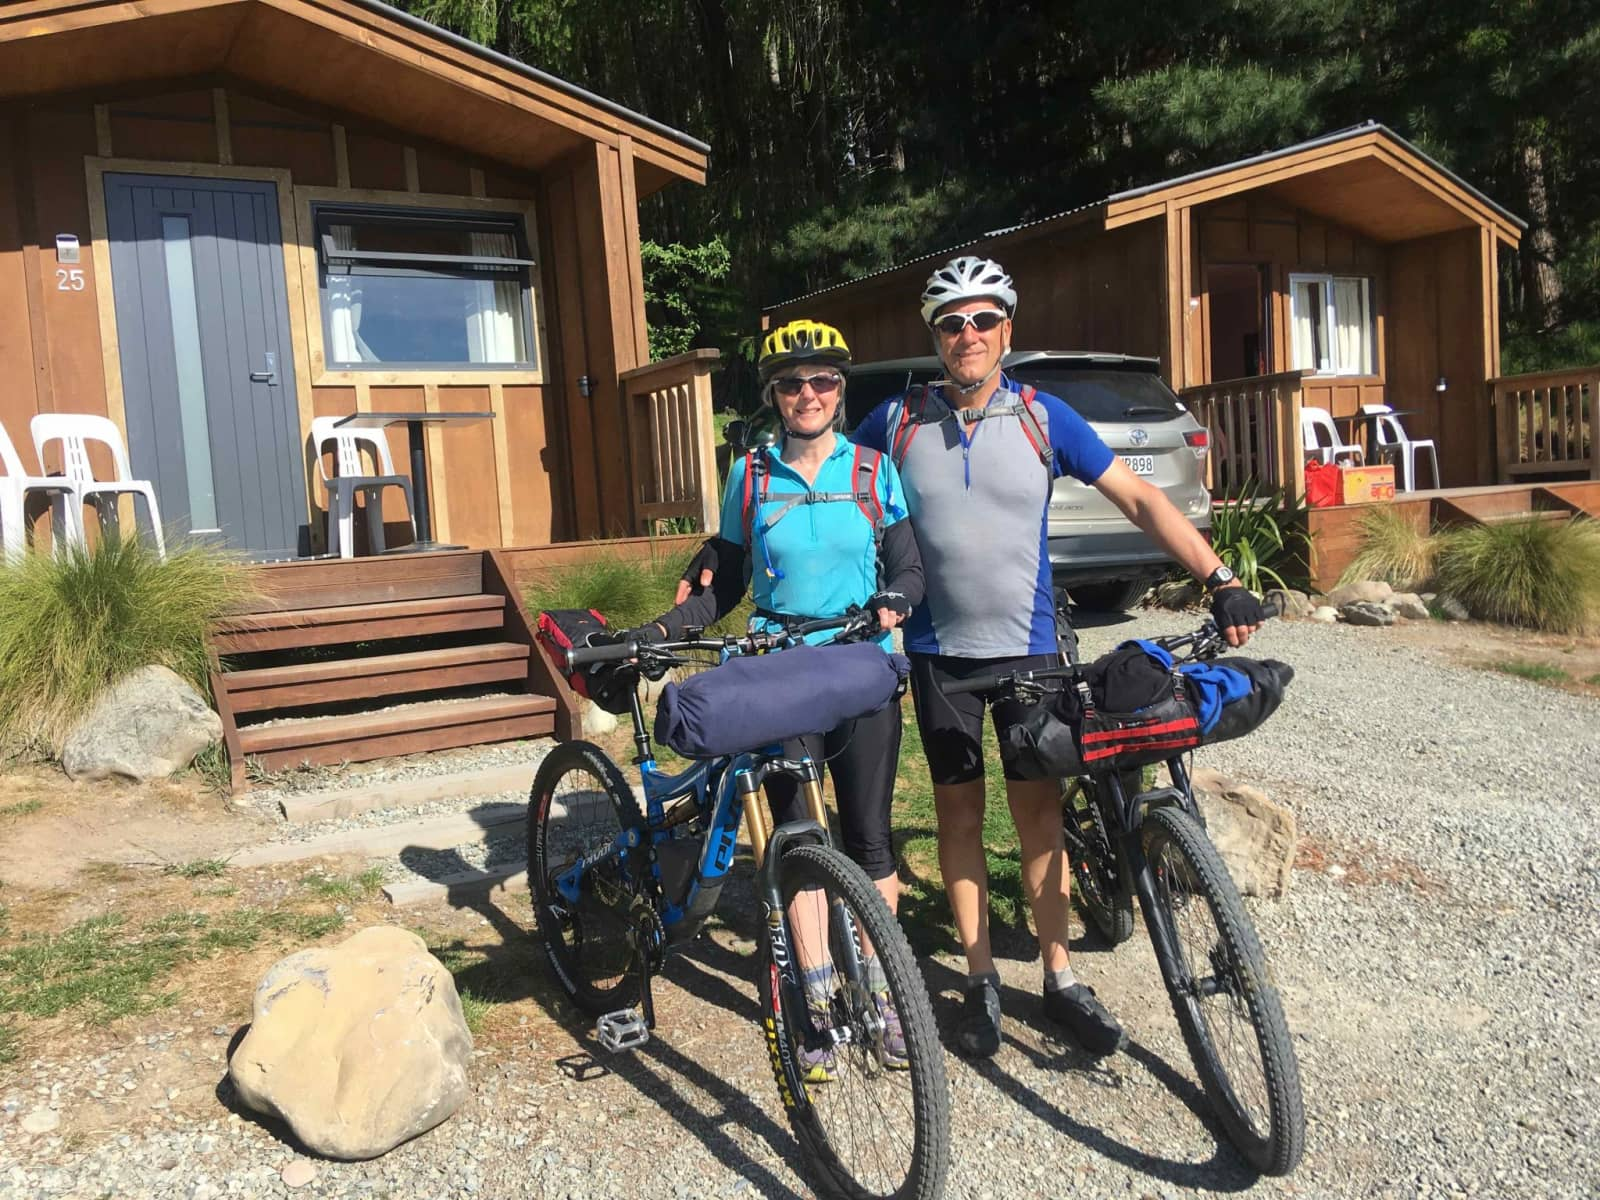 Bridget & Geoff from Matakana, New Zealand